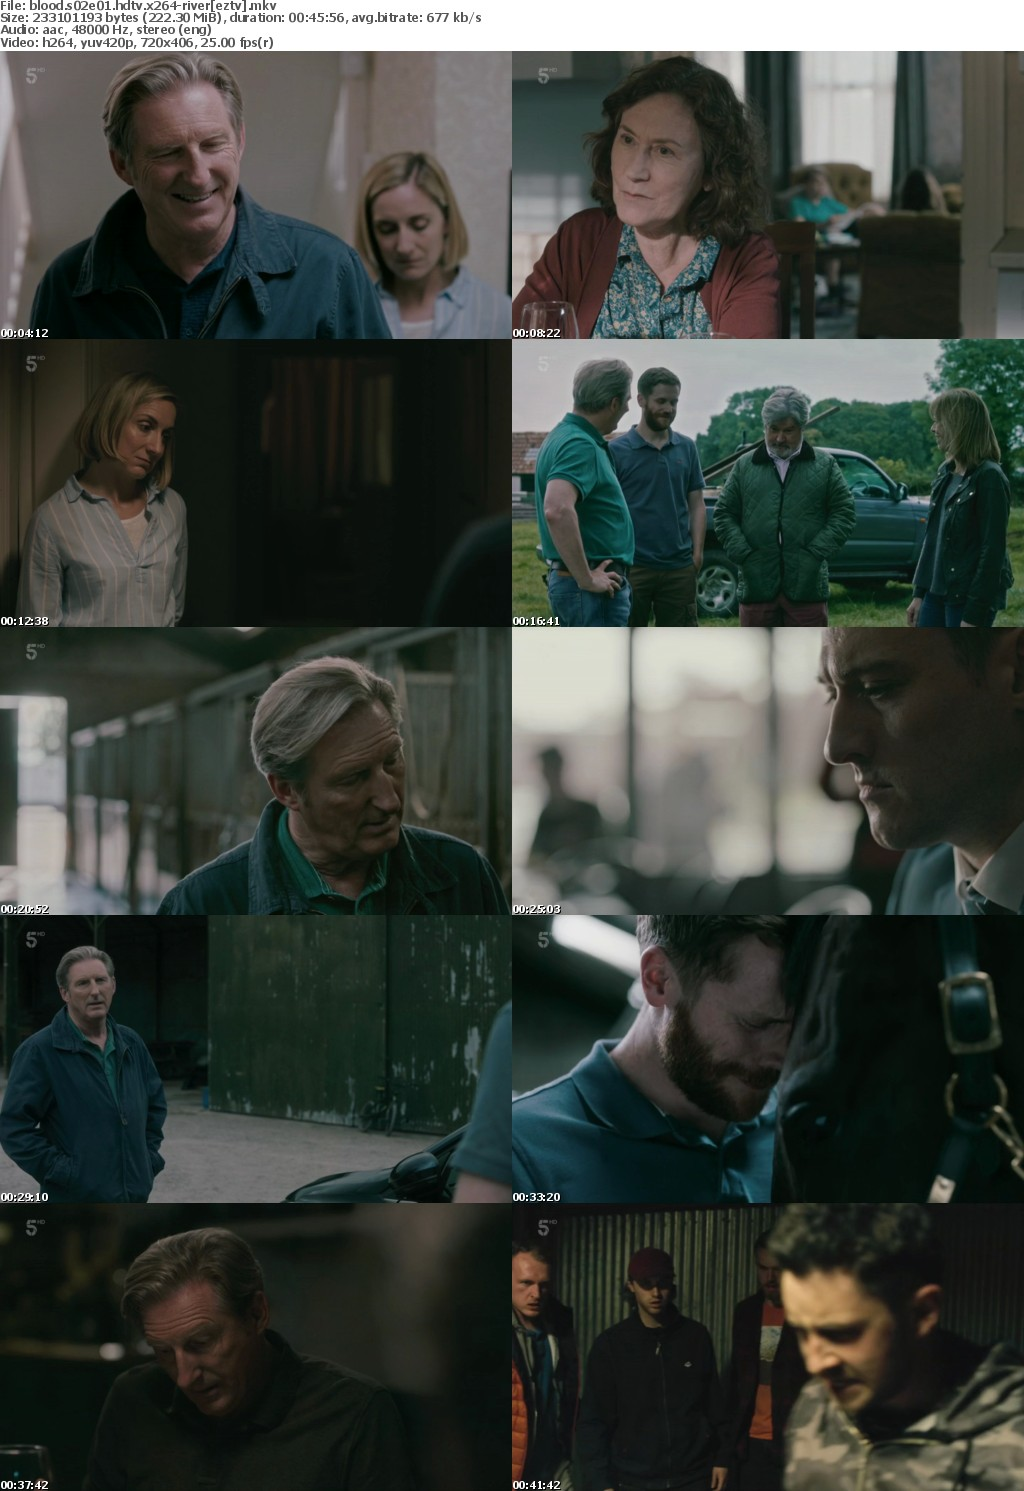 Blood S02E01 HDTV x264-RiVER